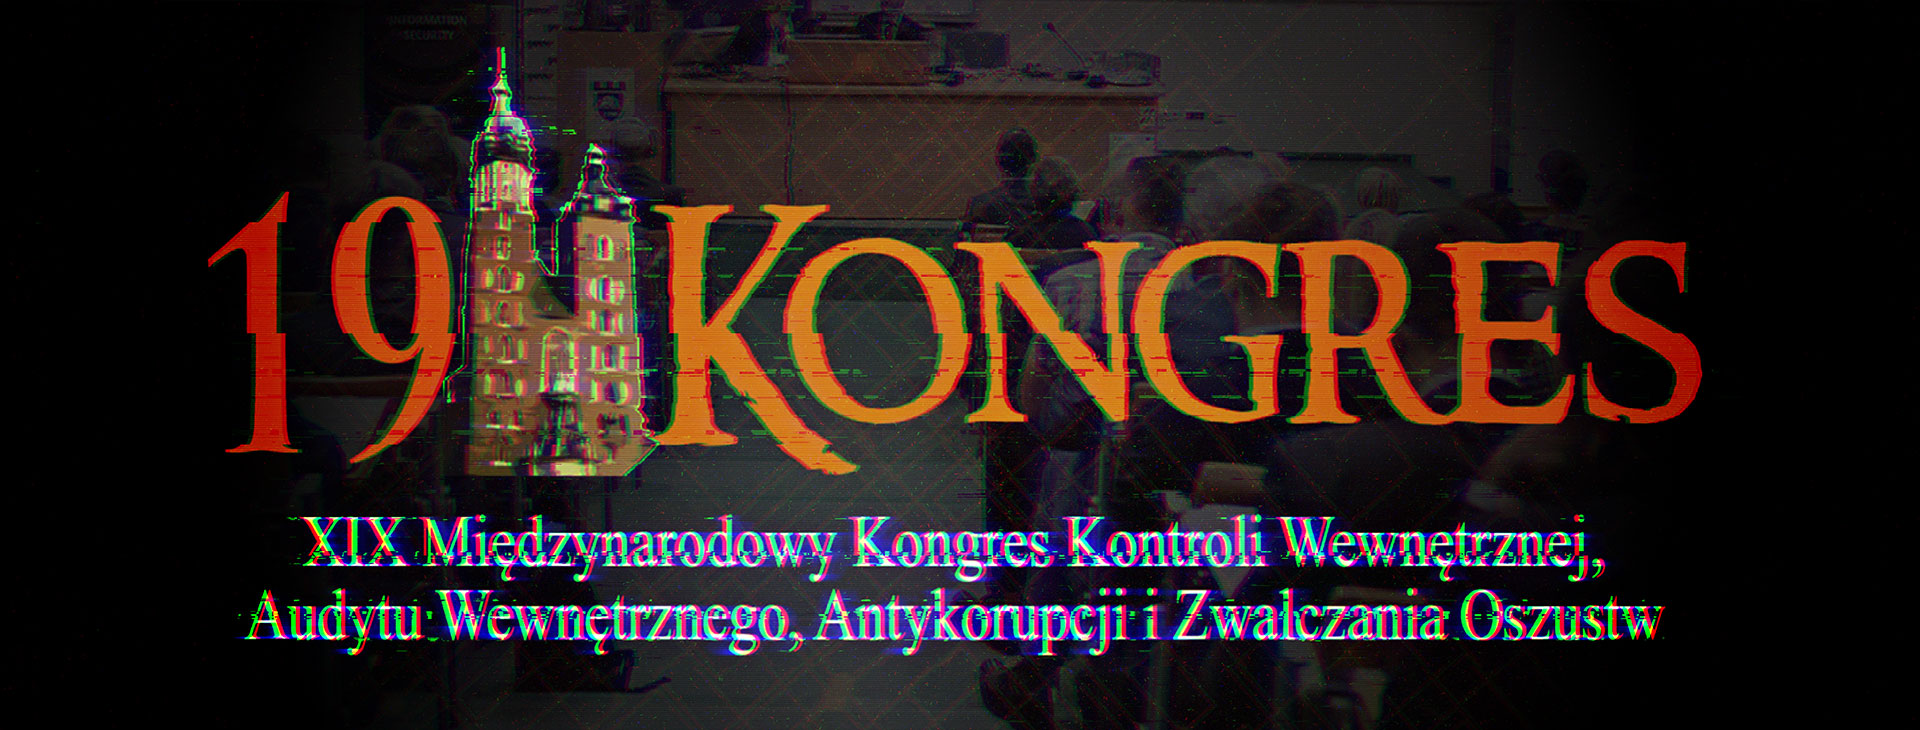 19-kongres-cover-fb-online-na-notatke-2